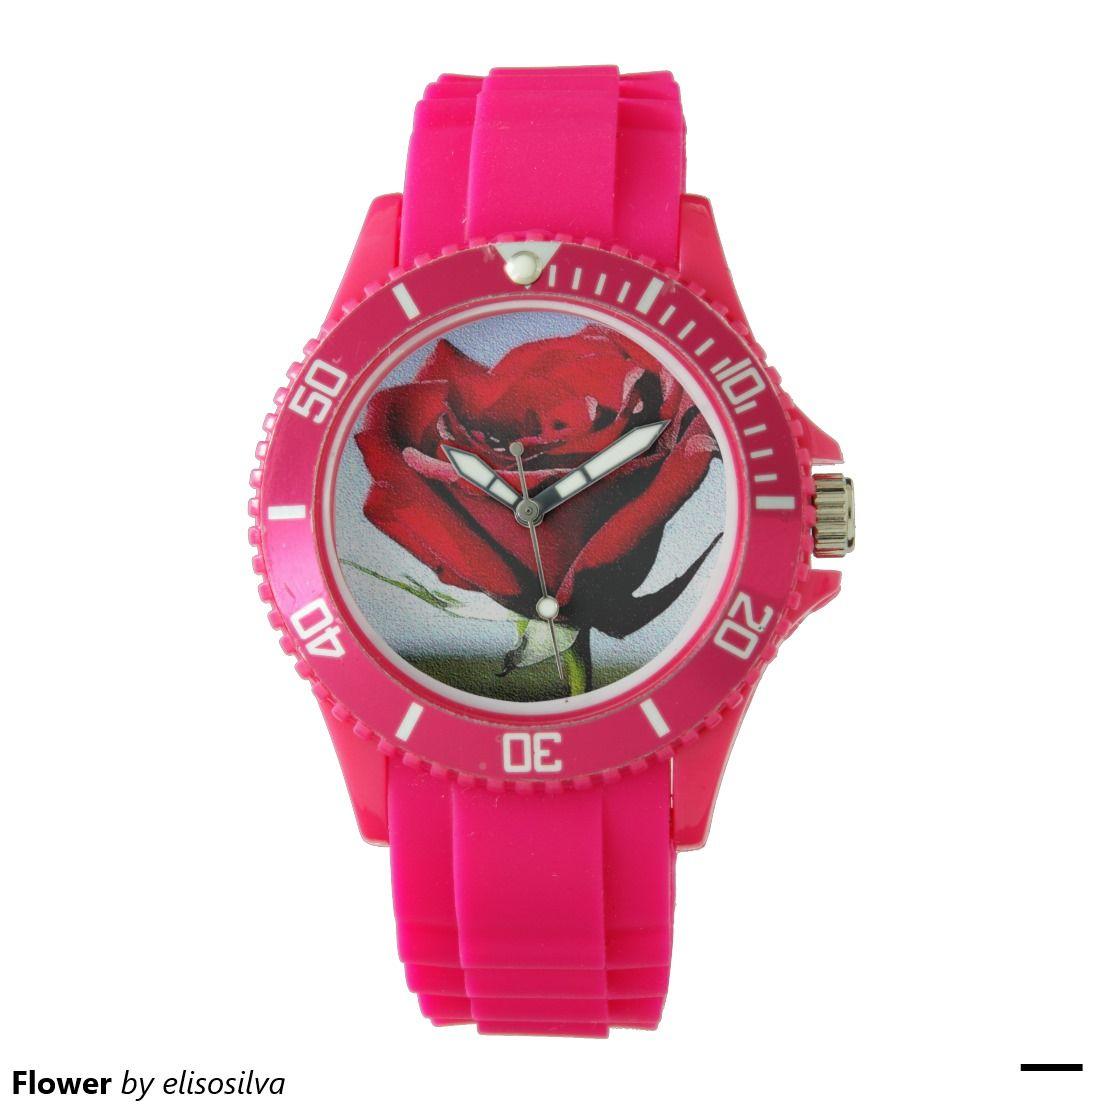 Tu reloj Reloj de pulsera deportivo de silicona rosa para mujer personalizado